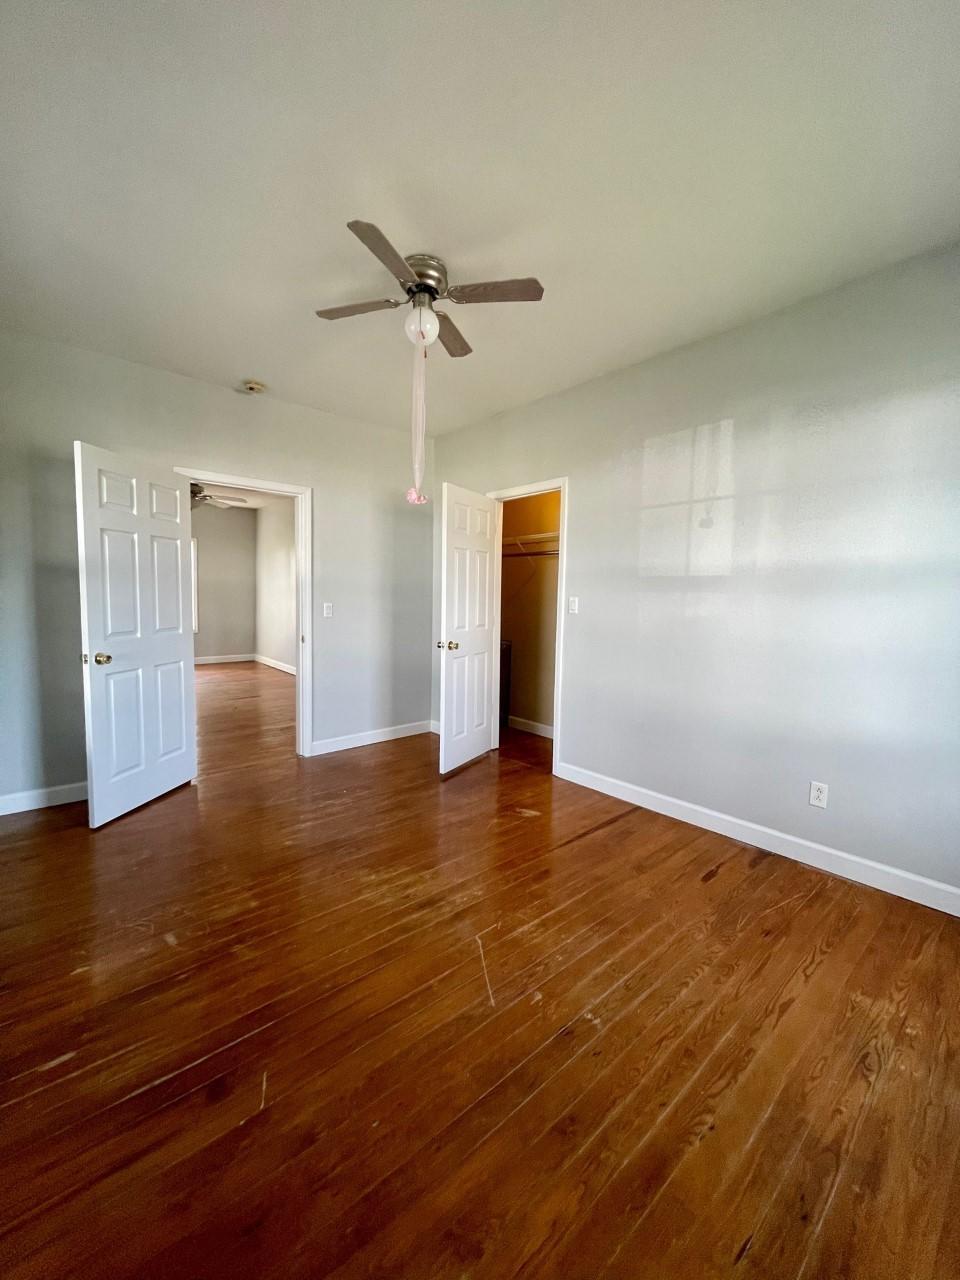 Bedroom 1 with hardwood floors